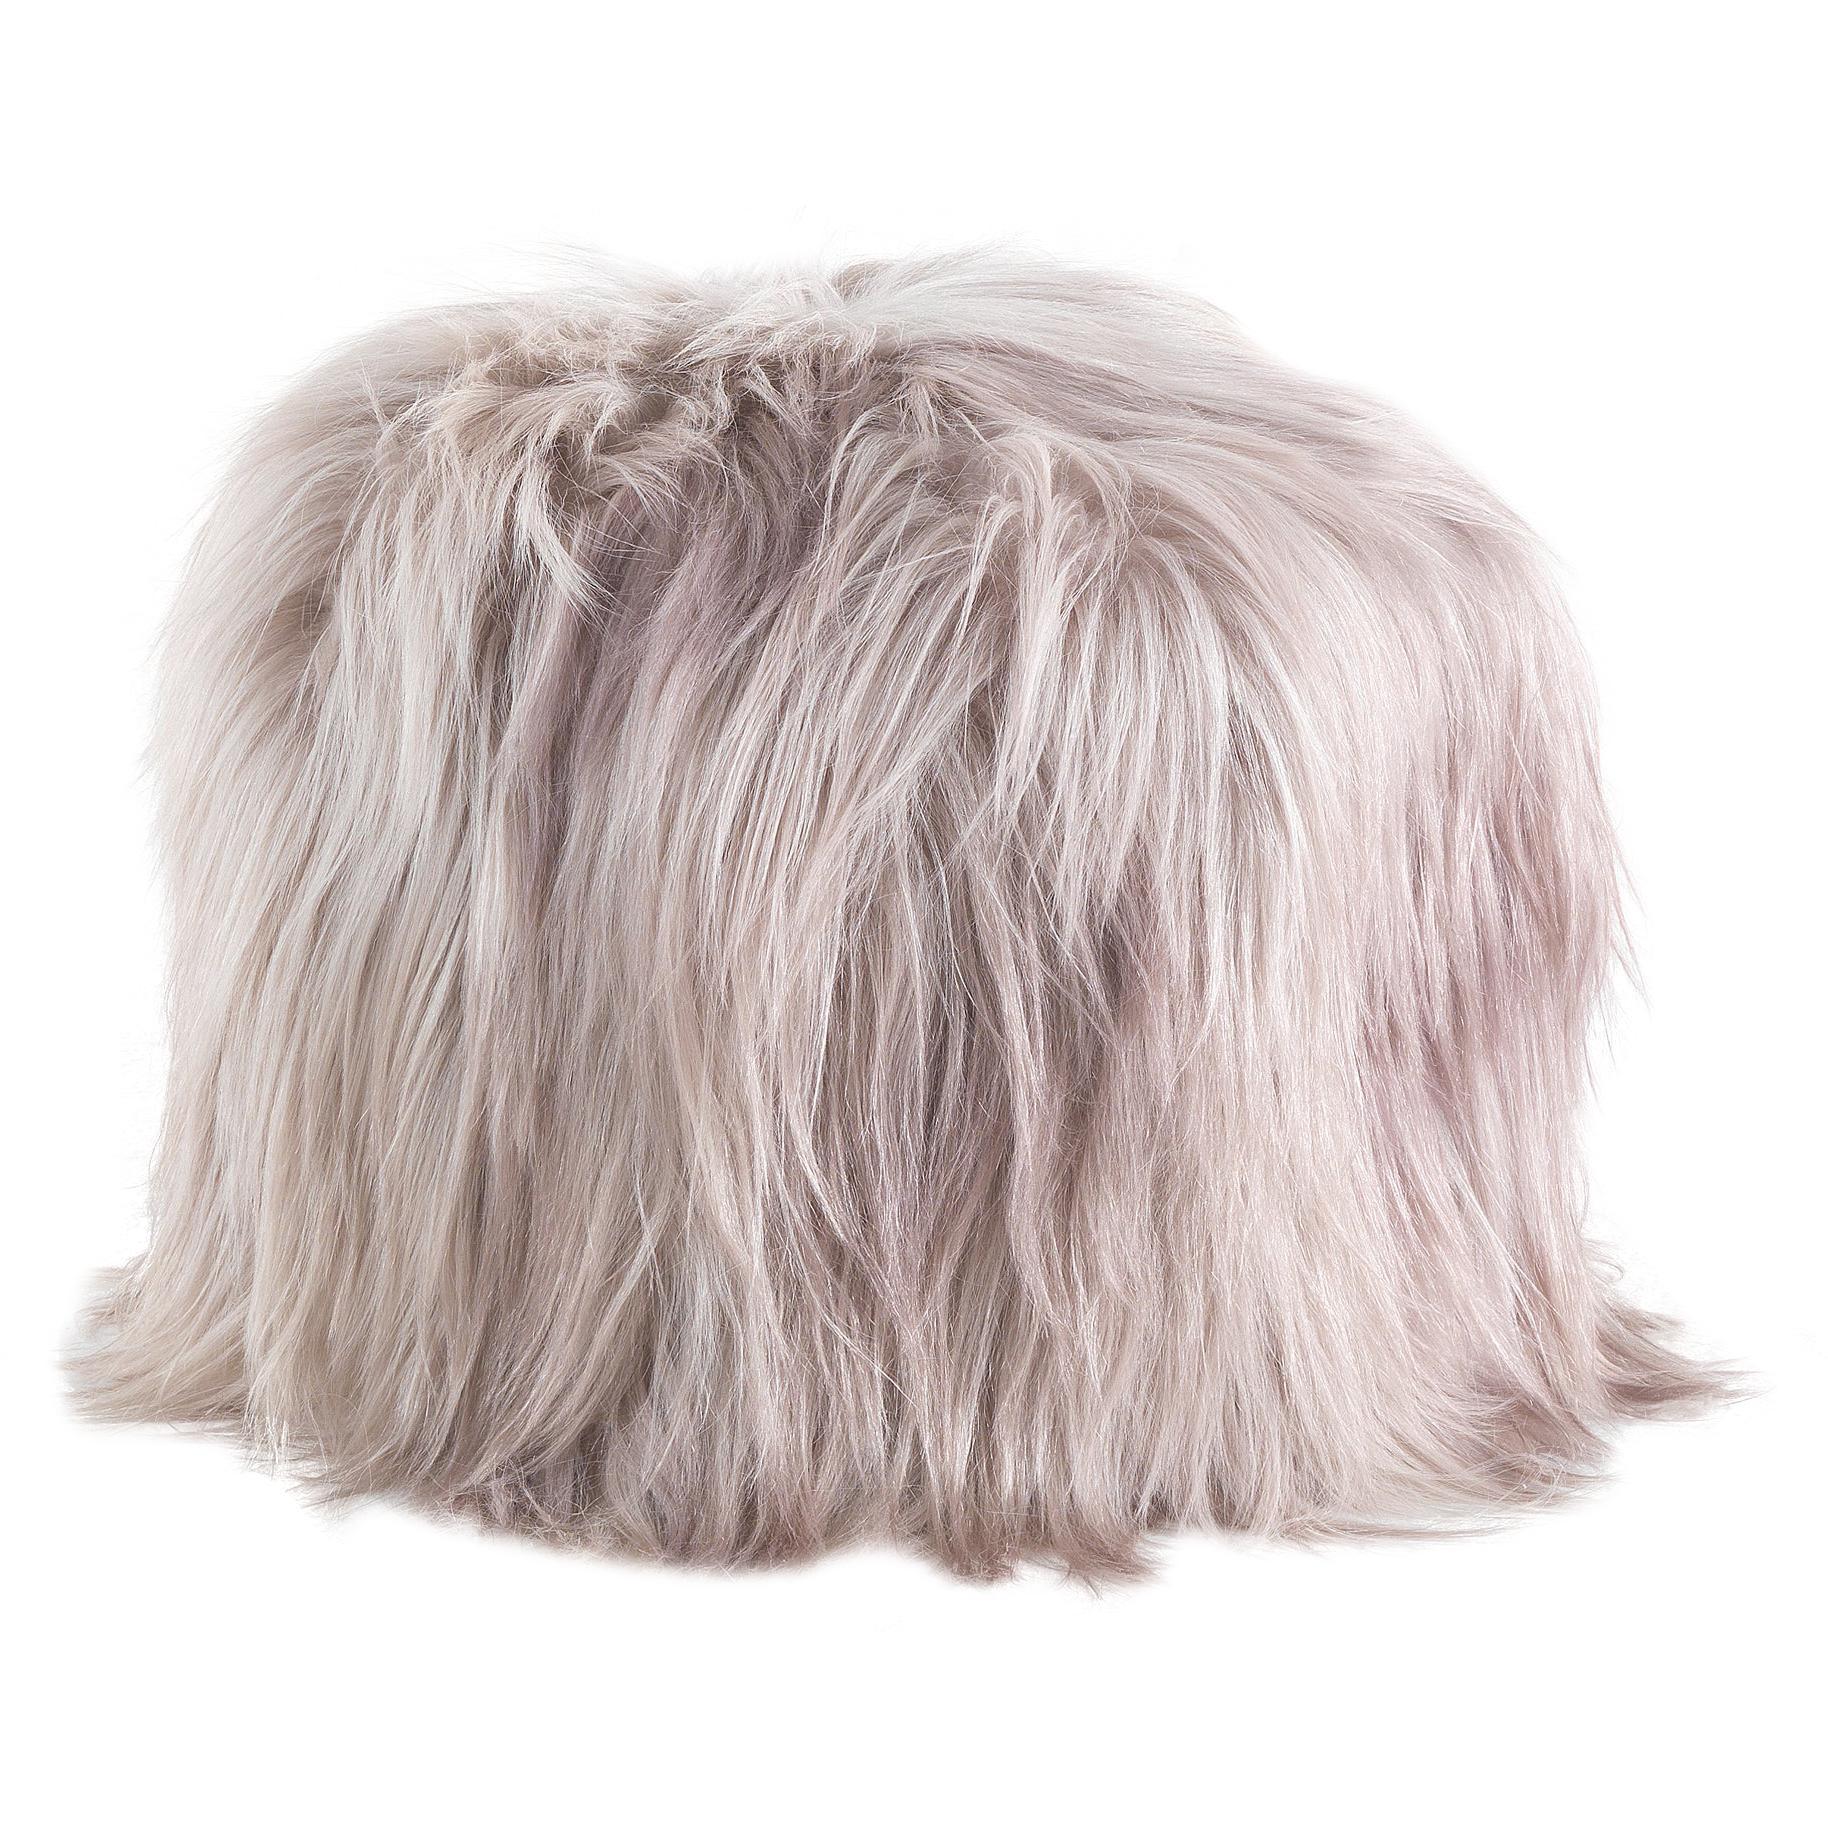 Limbo Beige Pouf in Fur by Roberto Cavalli Home Interiors